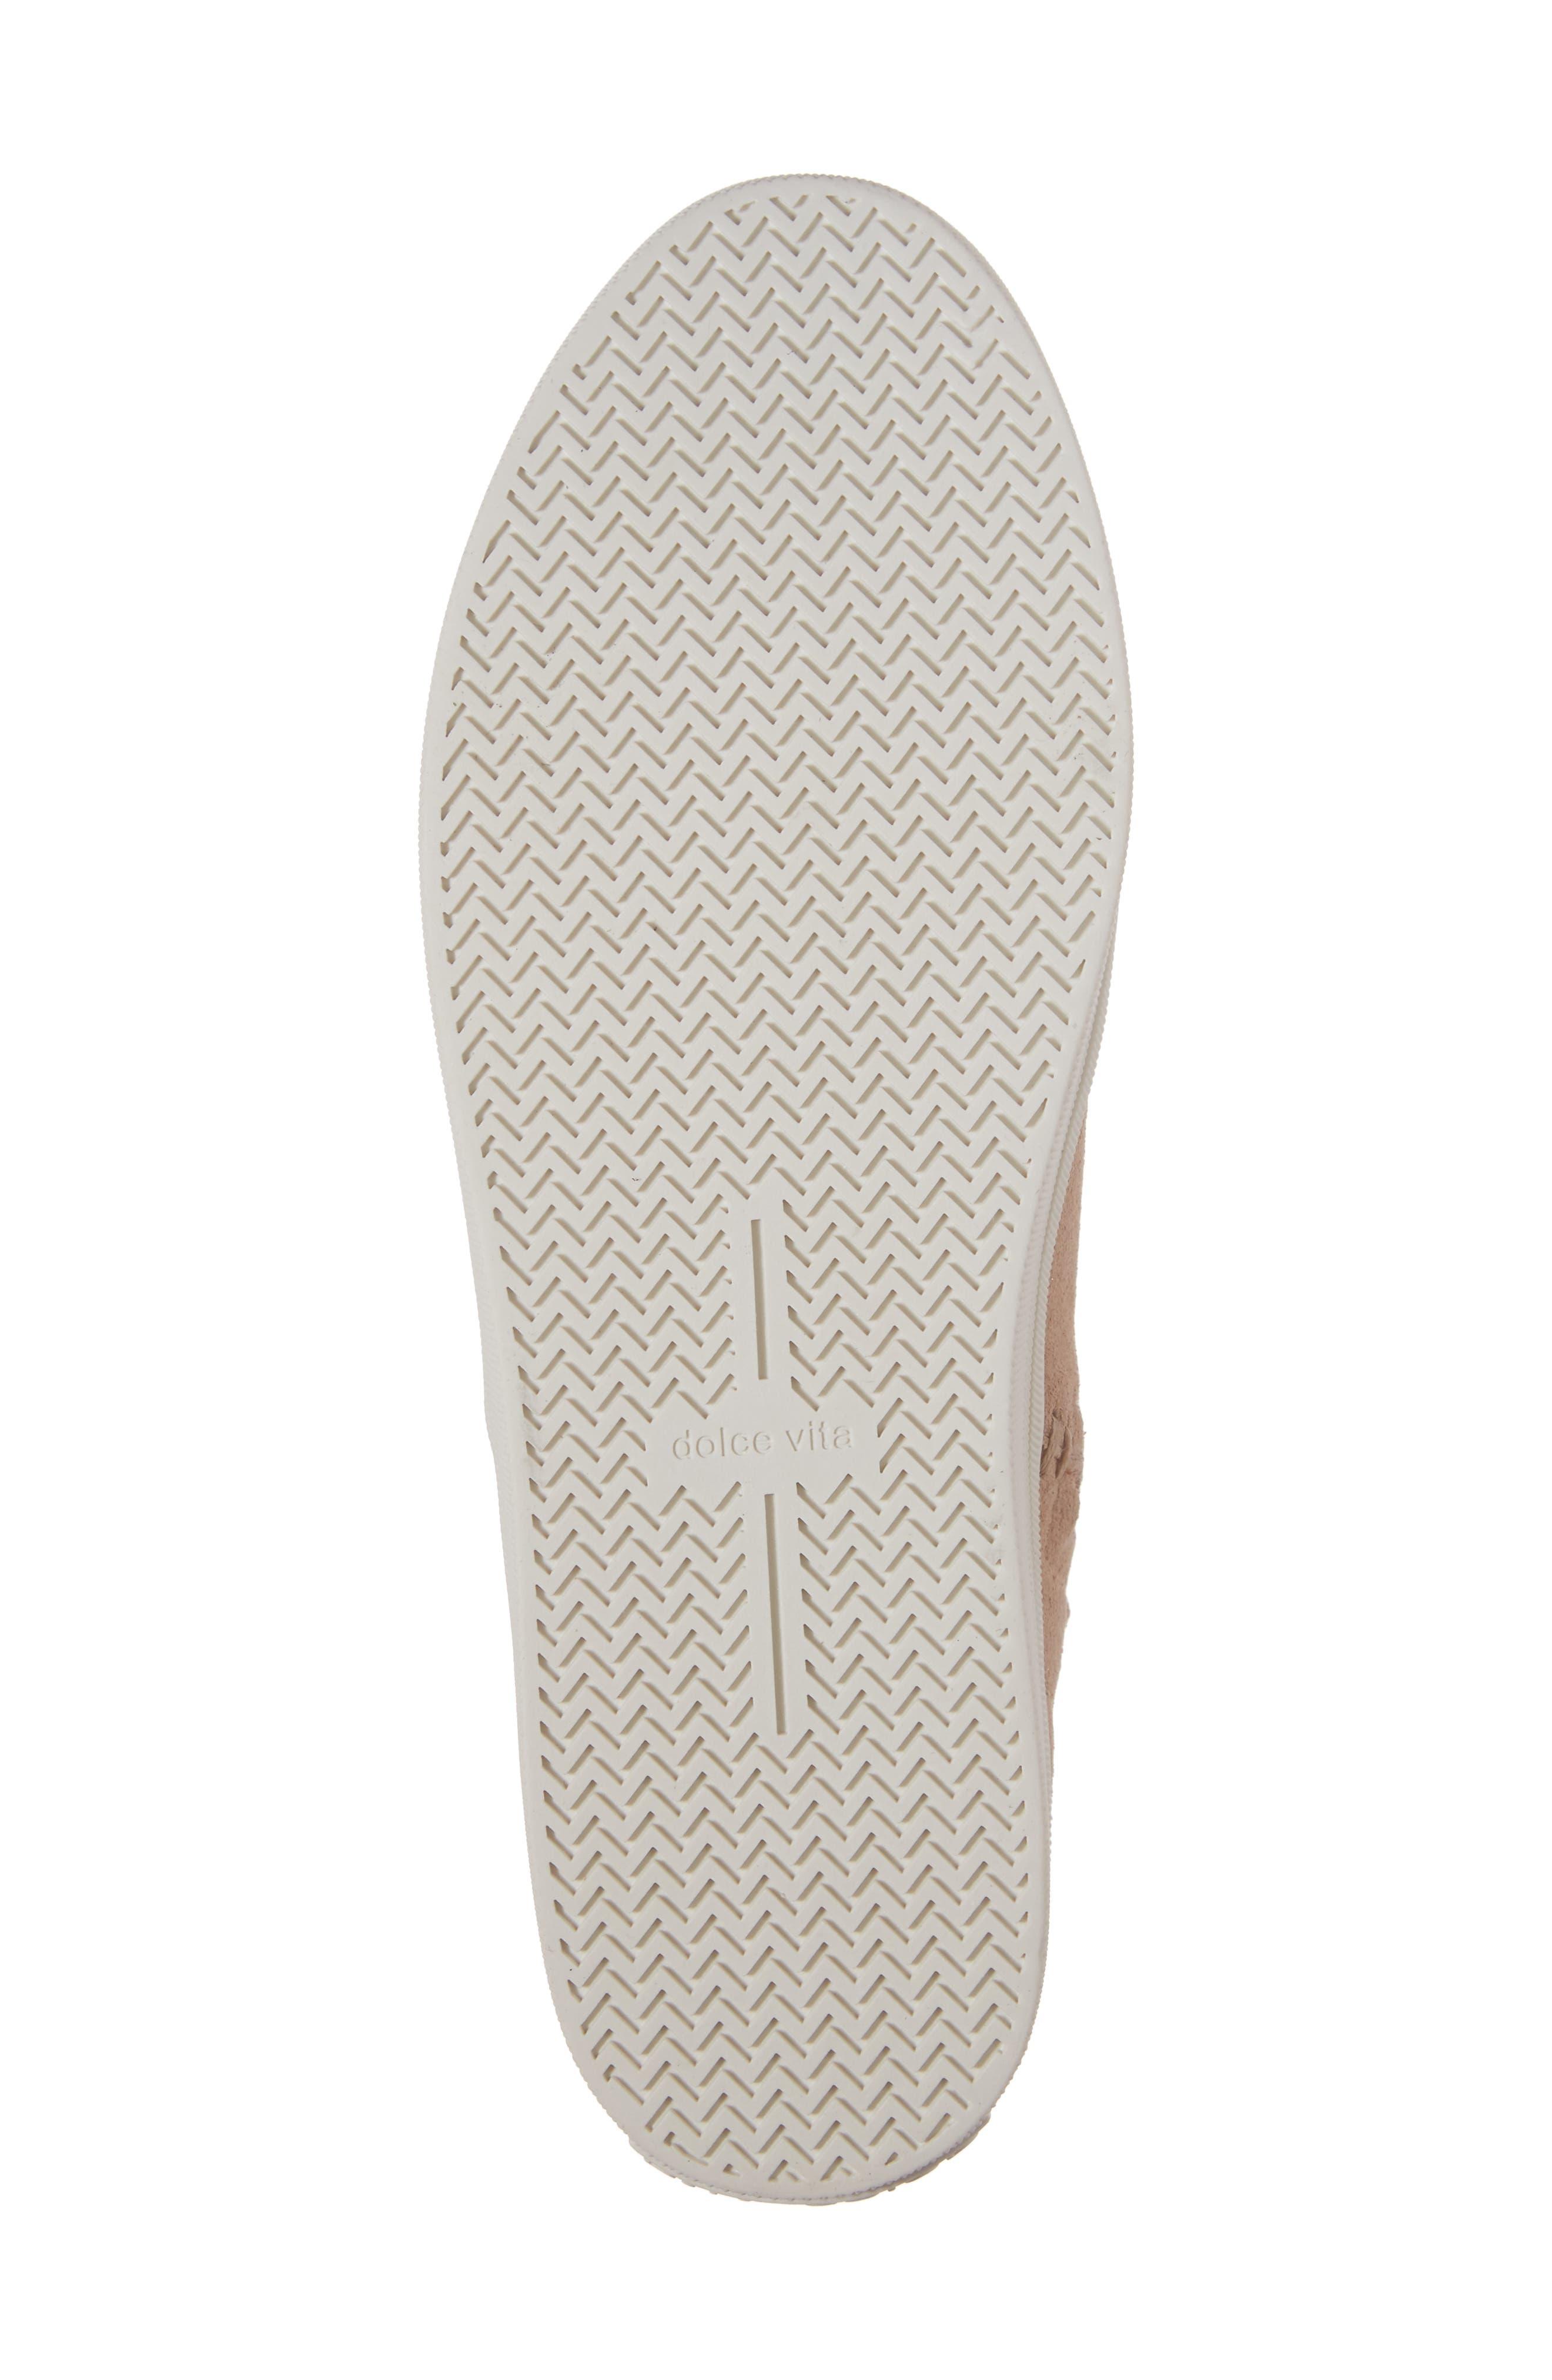 Tate Slip-On Sneaker,                             Alternate thumbnail 6, color,                             Blush Suede